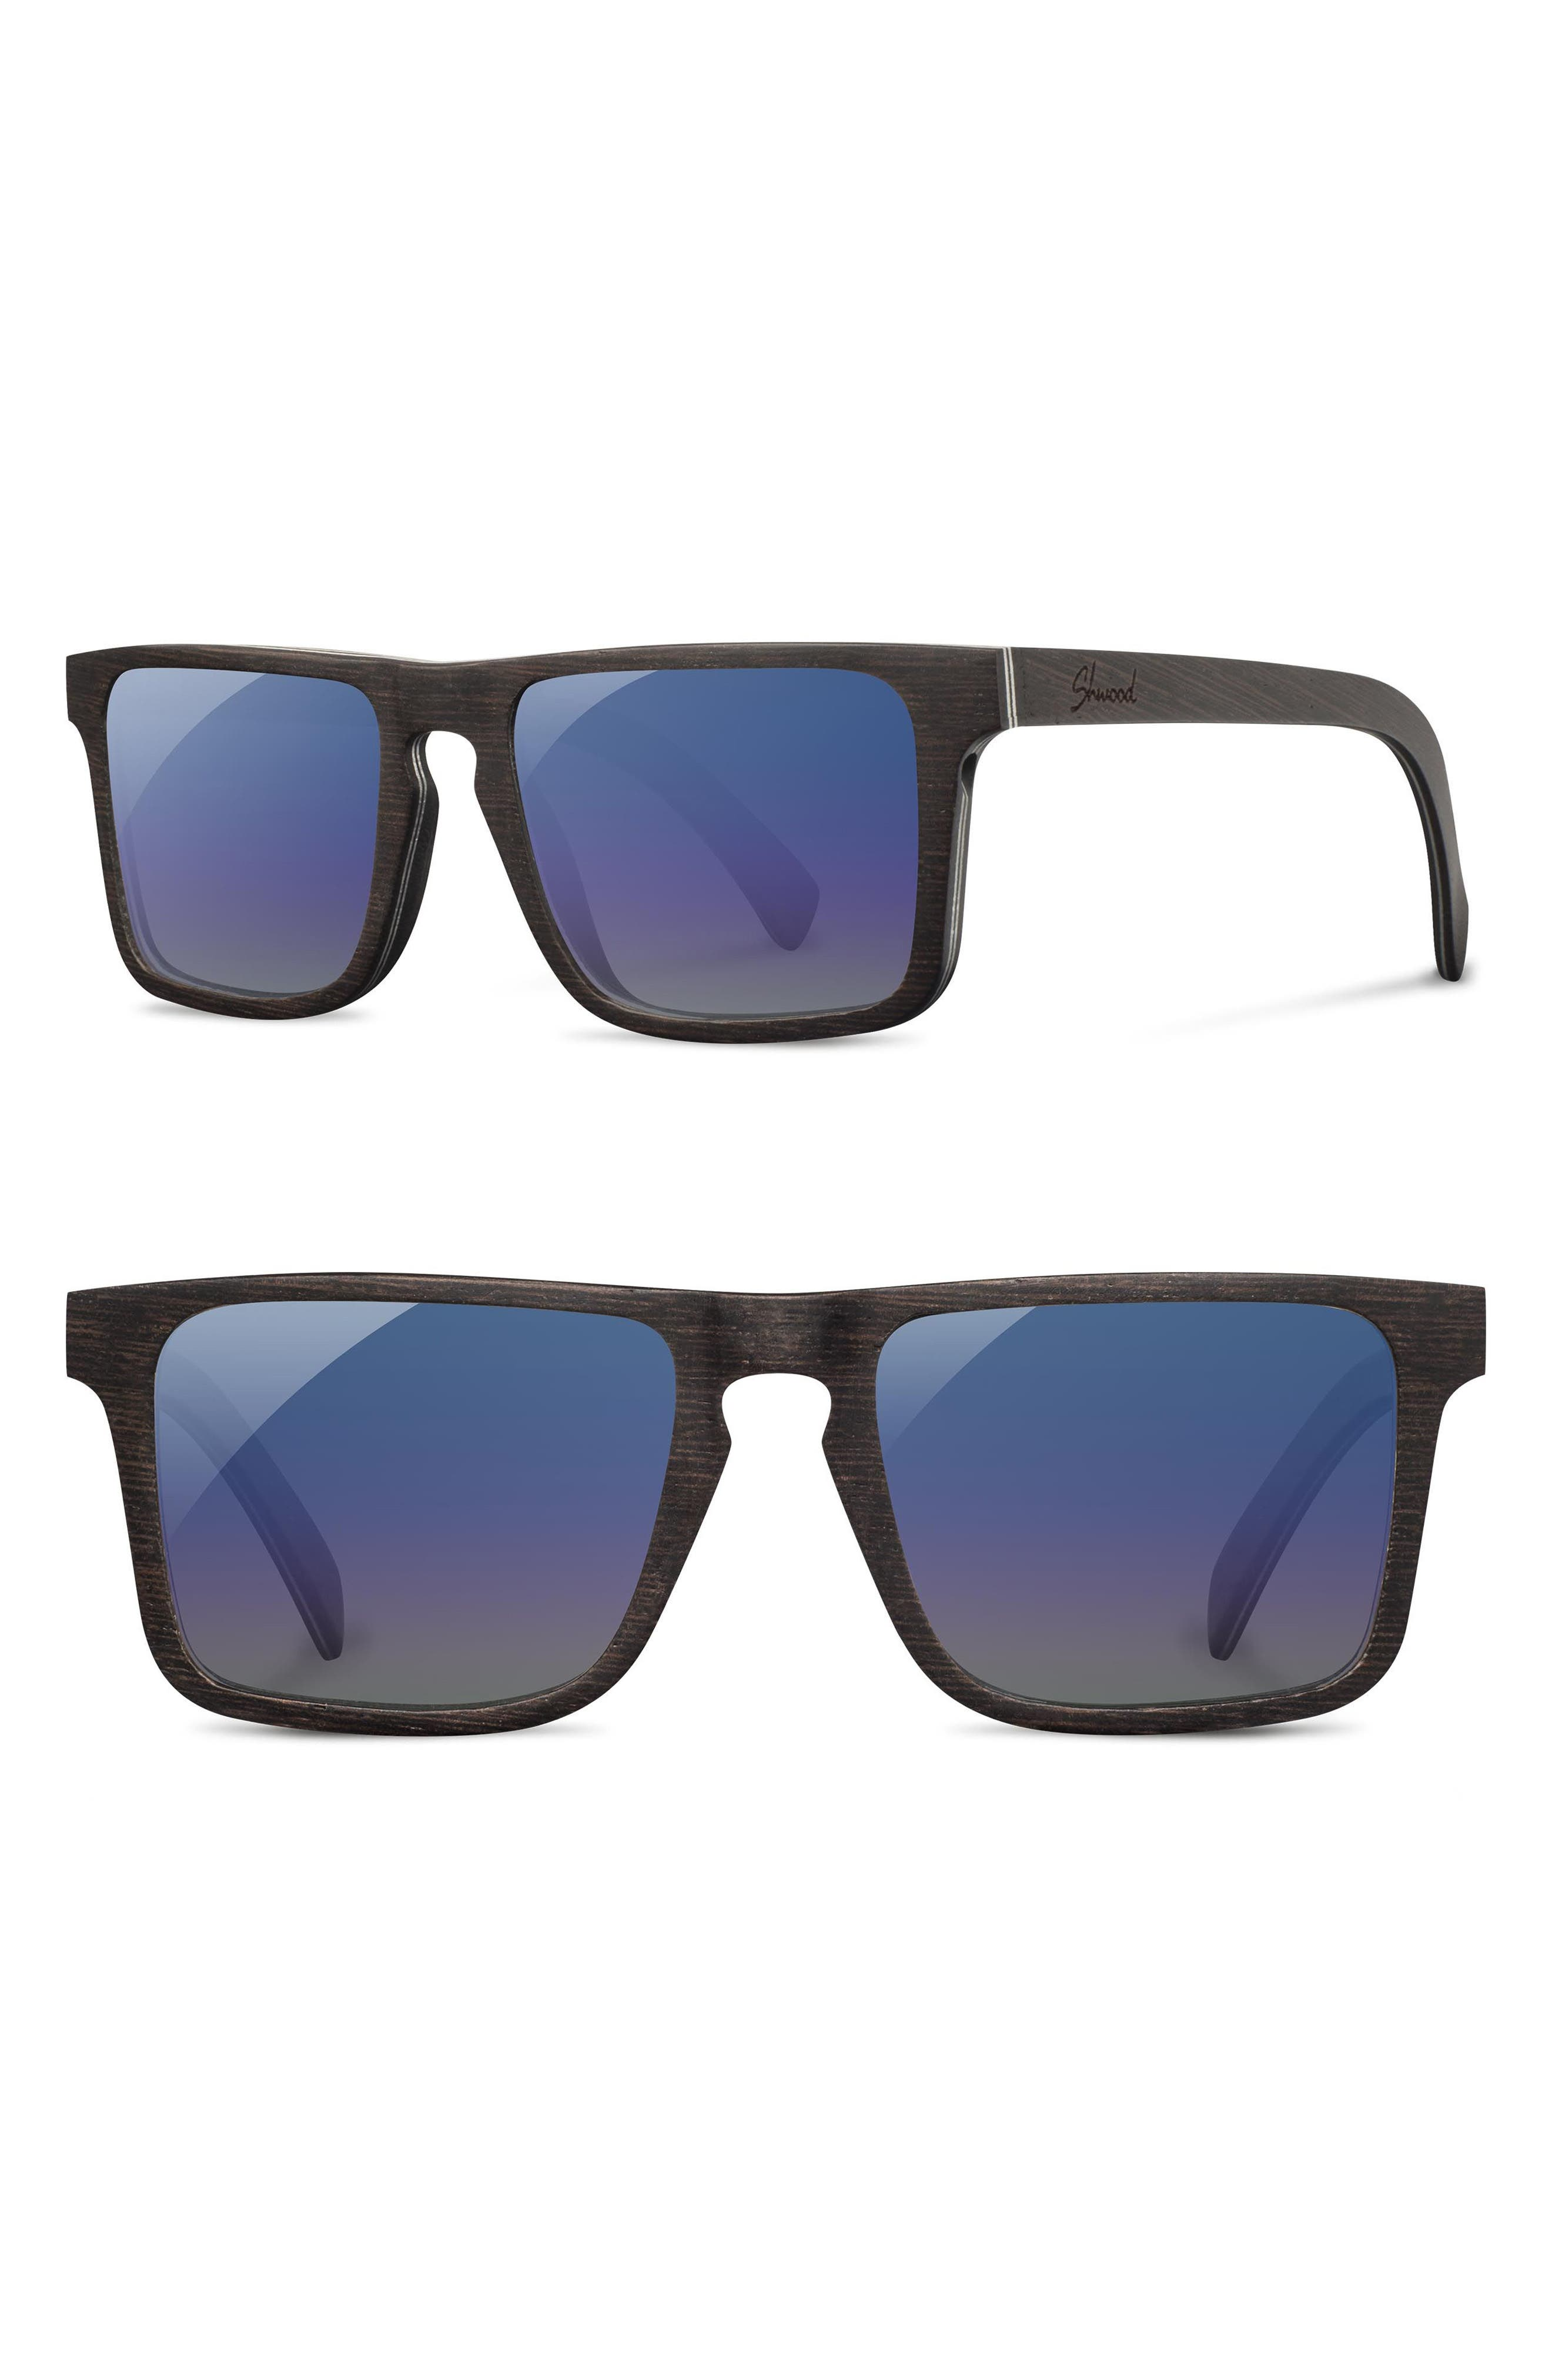 Govy 2 52mm Polarized Wood Sunglasses,                         Main,                         color, 001